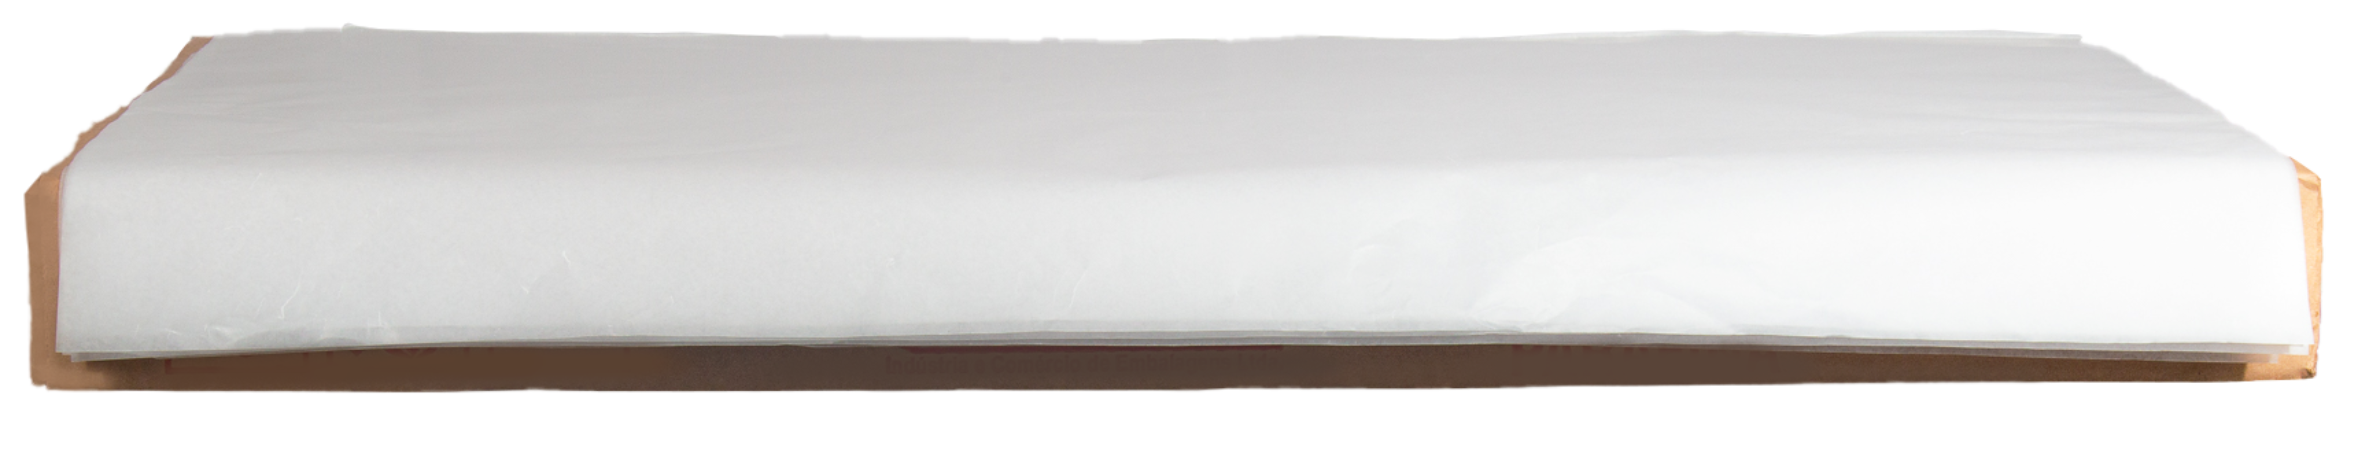 Papel Parafinado 80x110 cm - Fardo